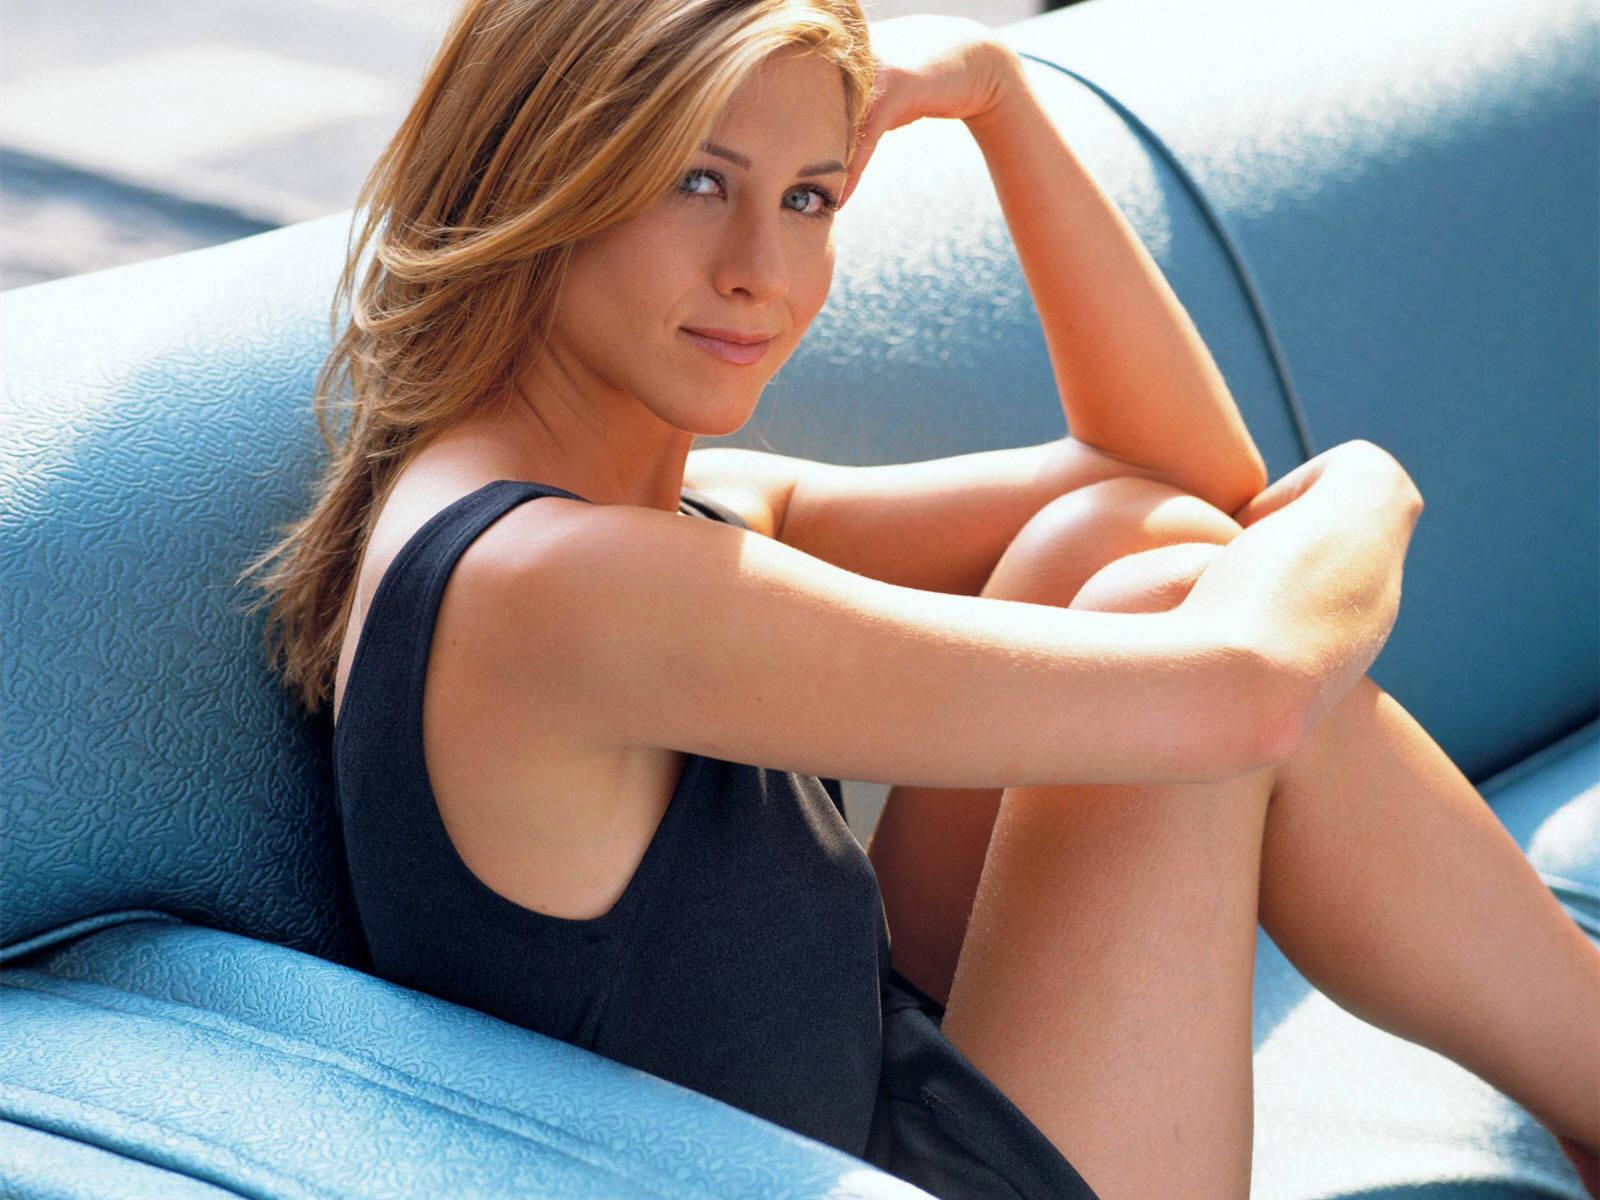 http://2.bp.blogspot.com/-eEKg0odcrkQ/TmTOuxJYS7I/AAAAAAAAATs/-dItMUZFuVk/s1600/Jennifer-Aniston-Hot-Pics-Corner-+%25282%2529.jpg